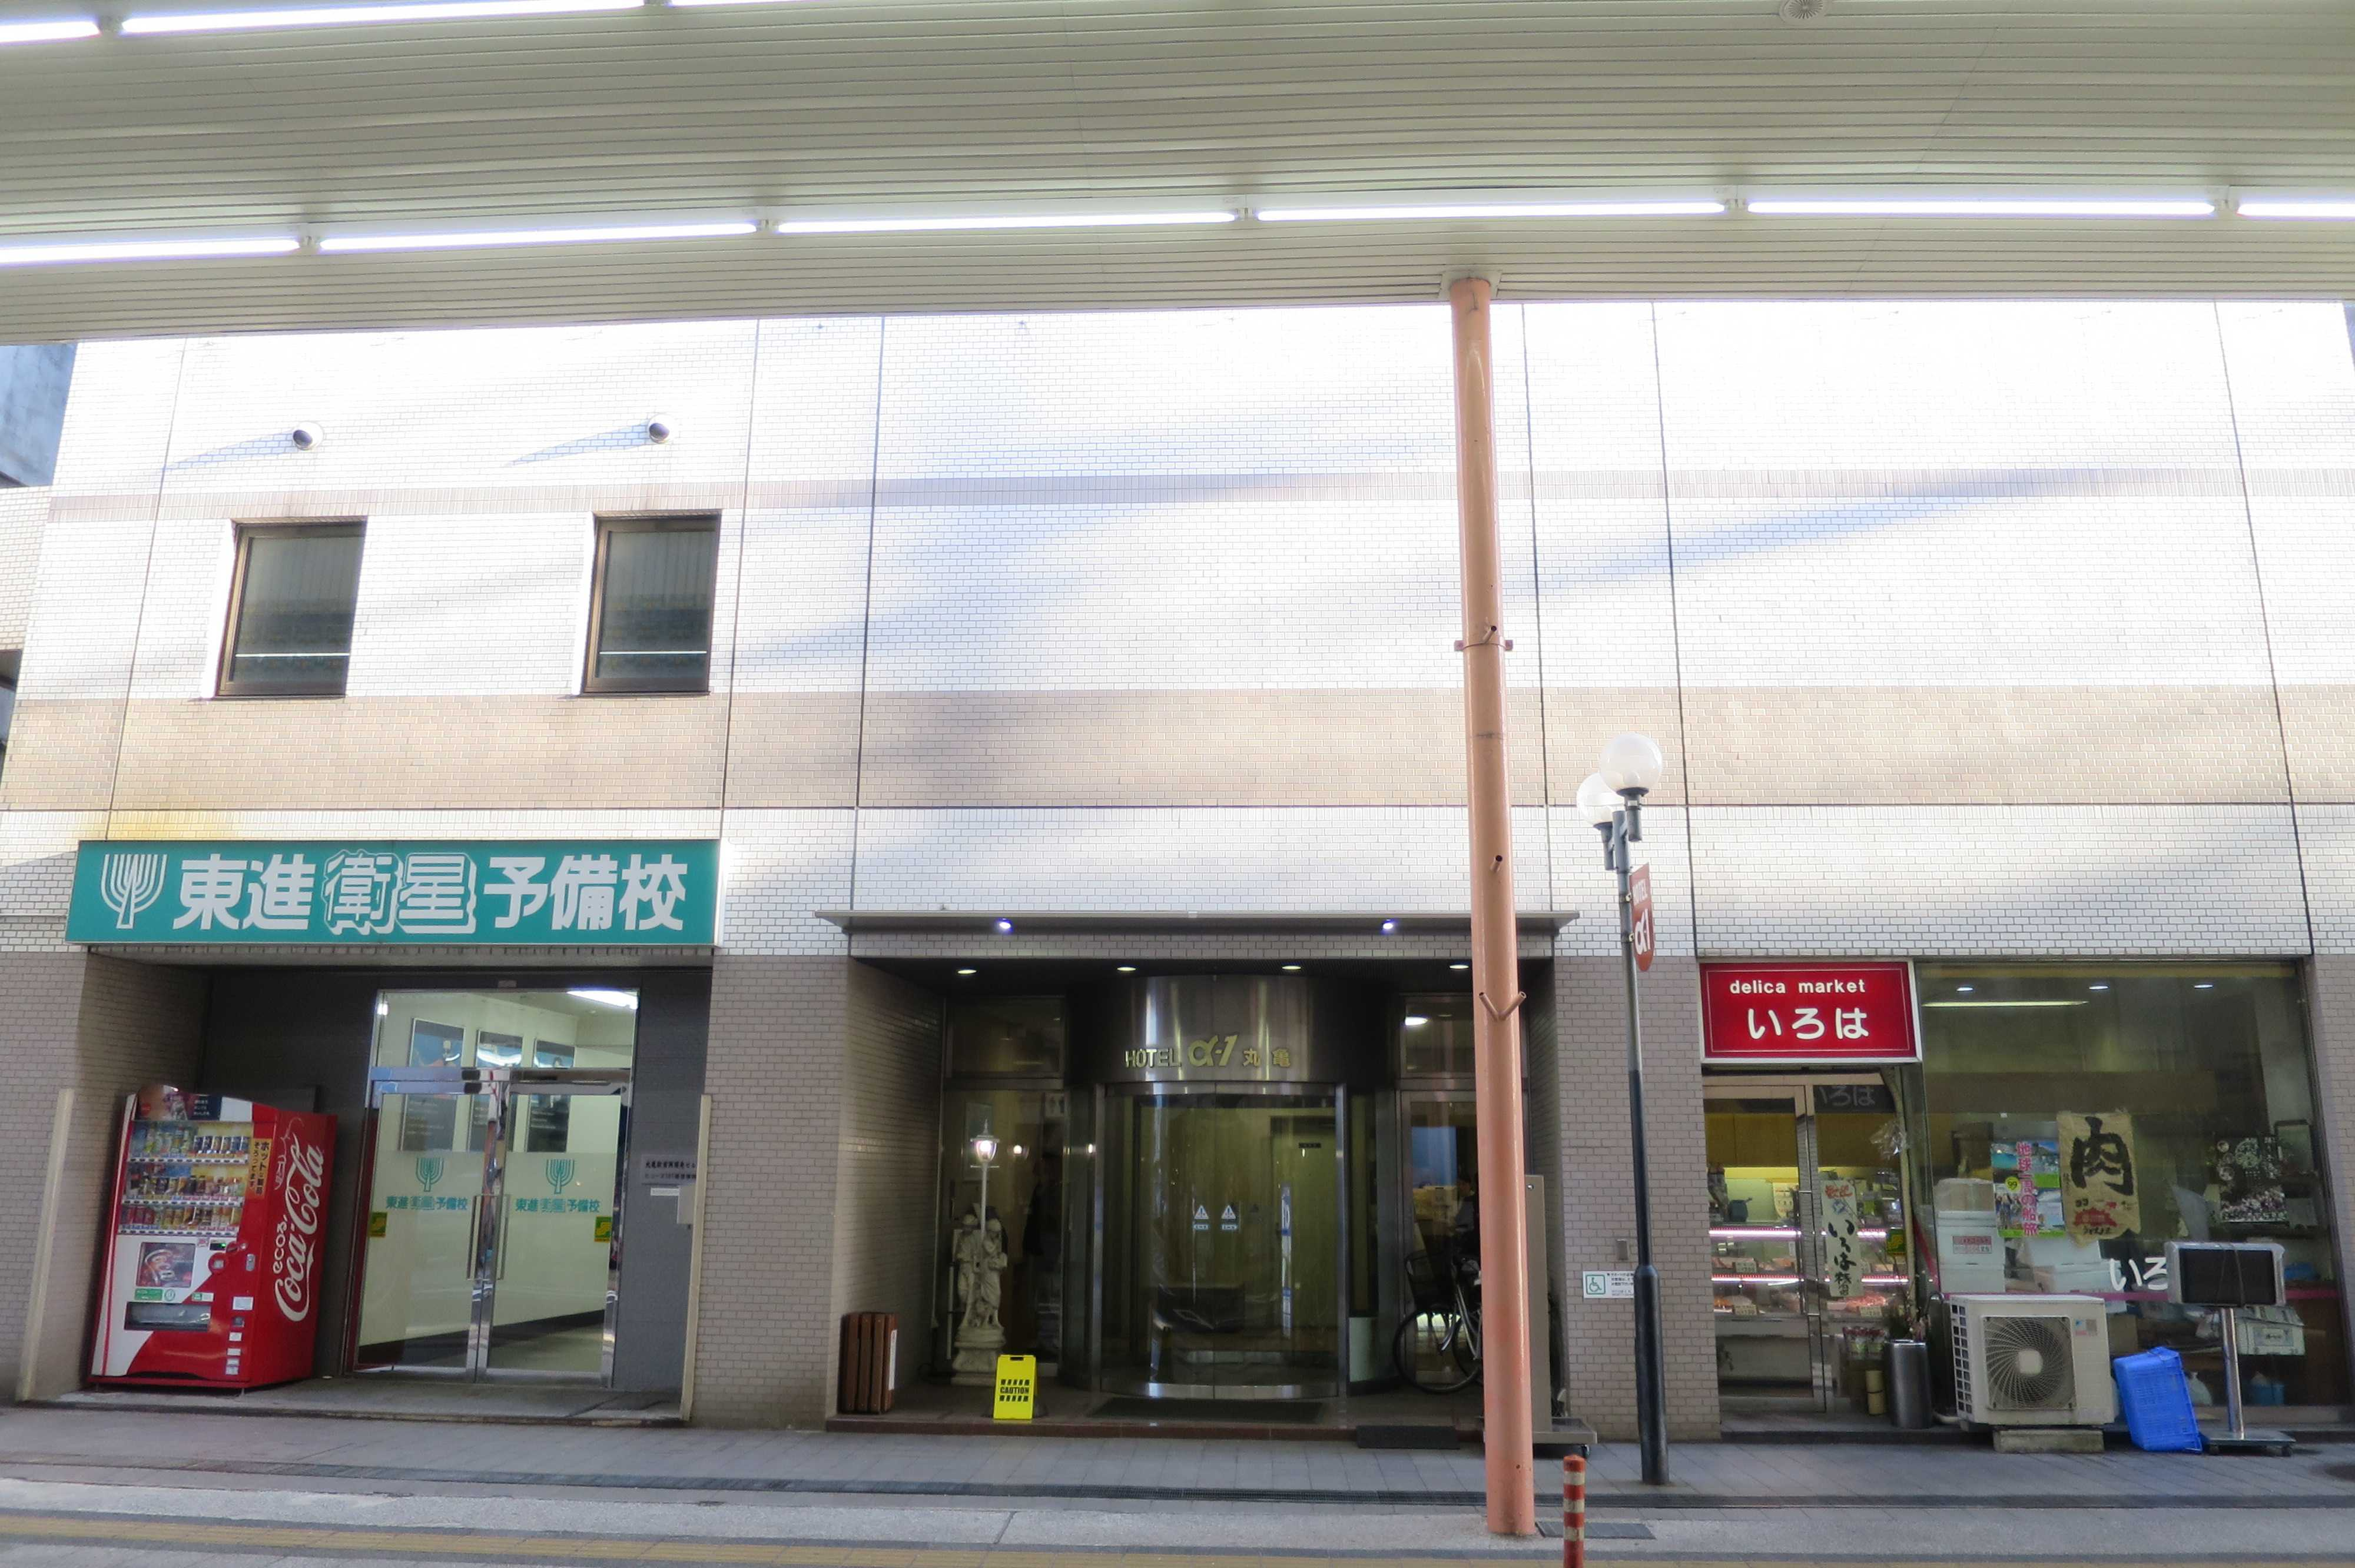 HOTEL α-1(ホテル・アルファ-ワン)丸亀